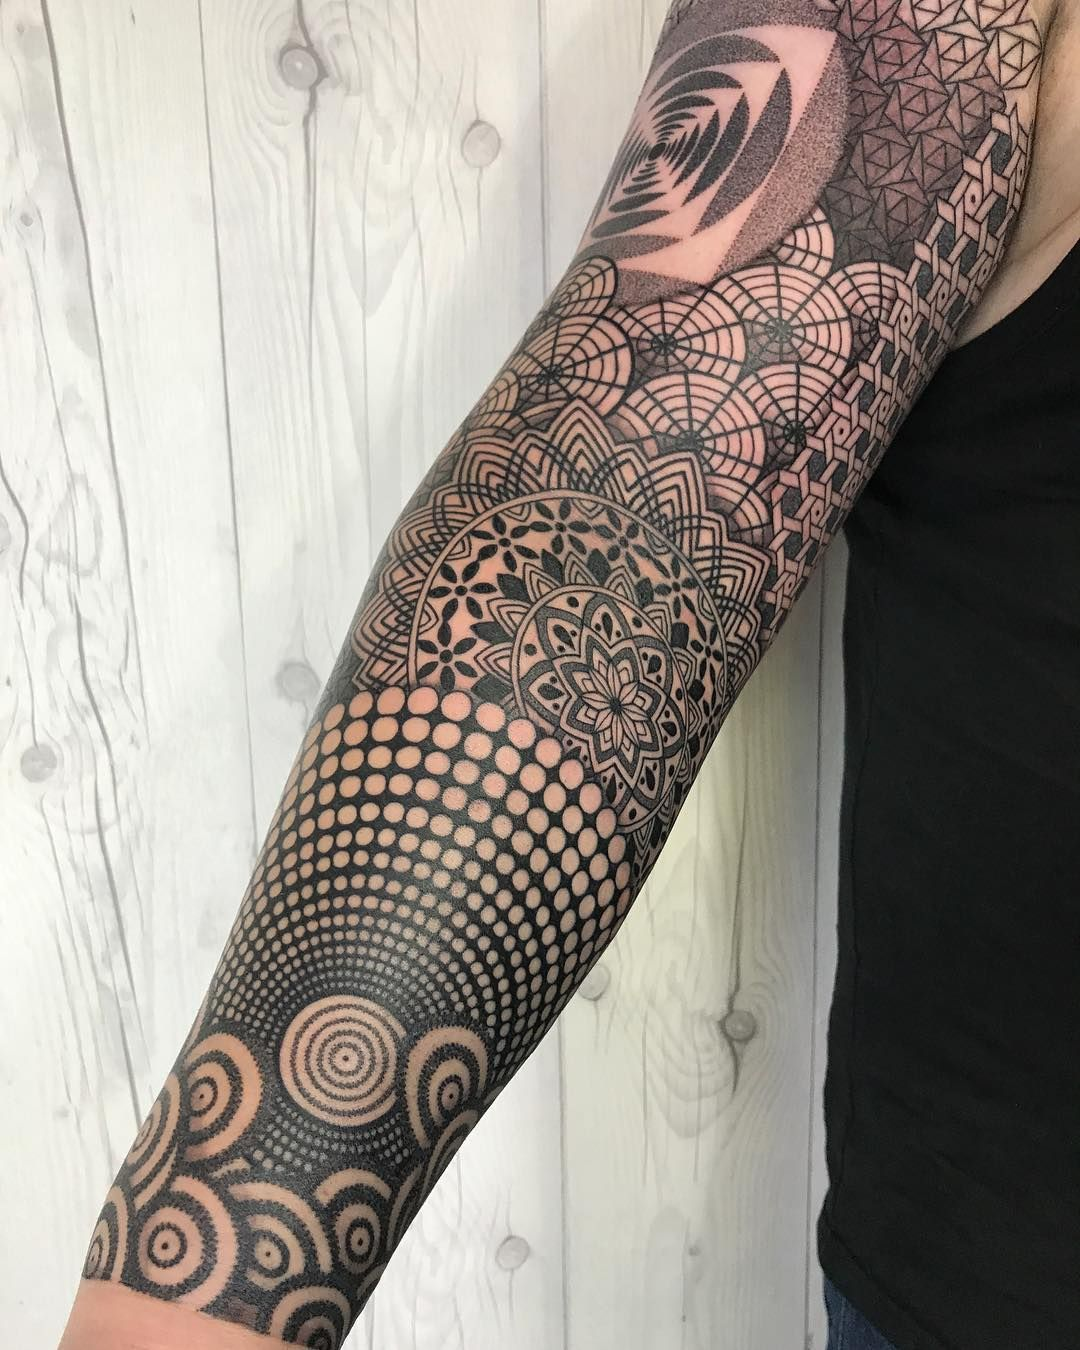 11k Likes 72 Comments Nissaco Nissaco On Instagram Detail Of Full Sleeve On Jason From Sleeve Tattoos For Women Geometric Sleeve Tattoo Geometry Tattoo